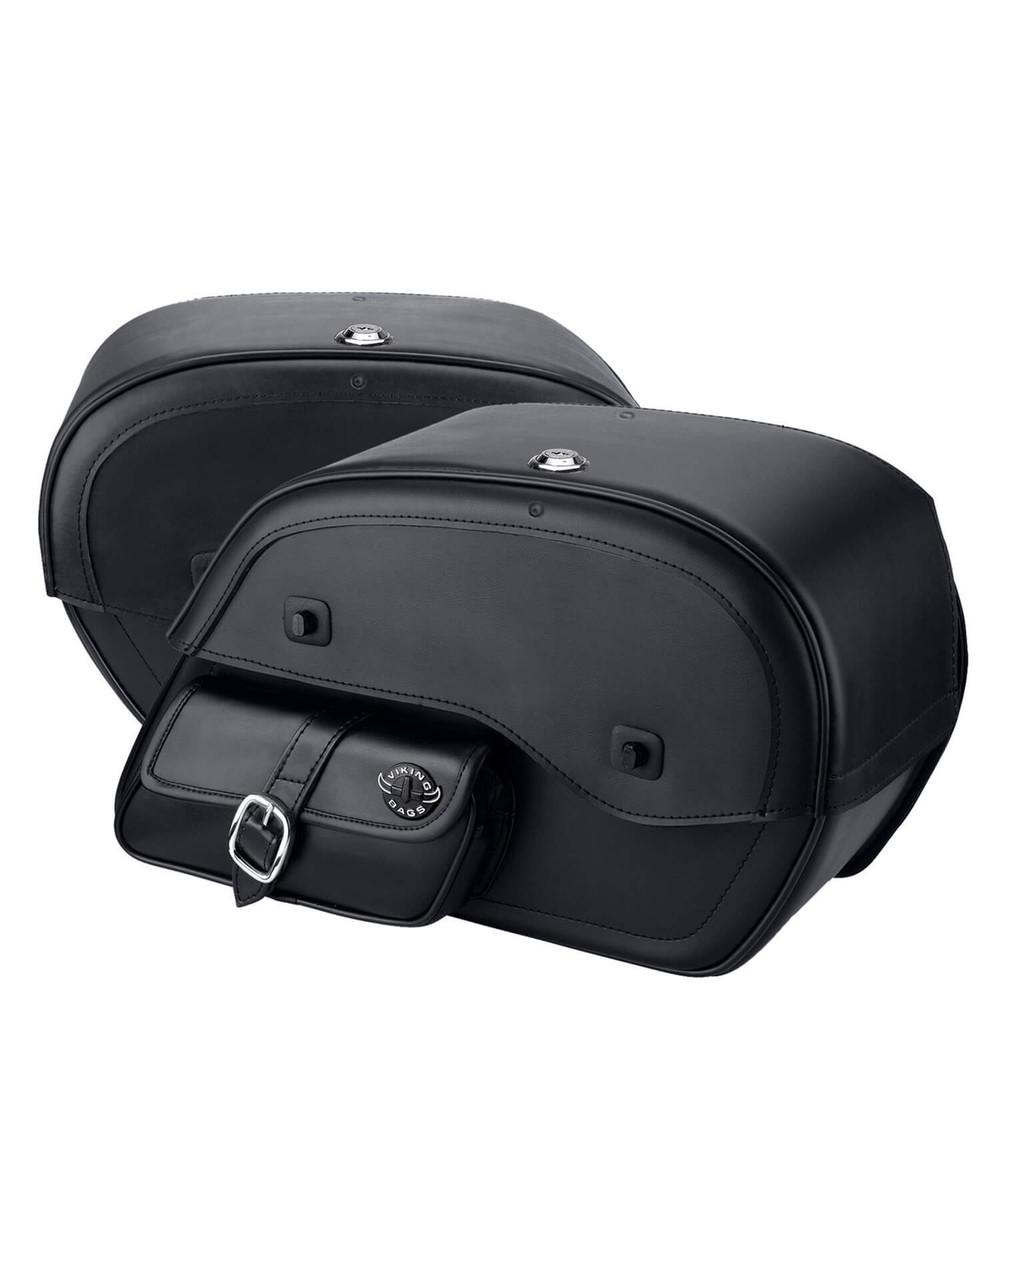 Kawasaki 1600 Mean Streak Charger Side Pocket With Shock Cutout Motorcycle Saddlebags Both Bags View